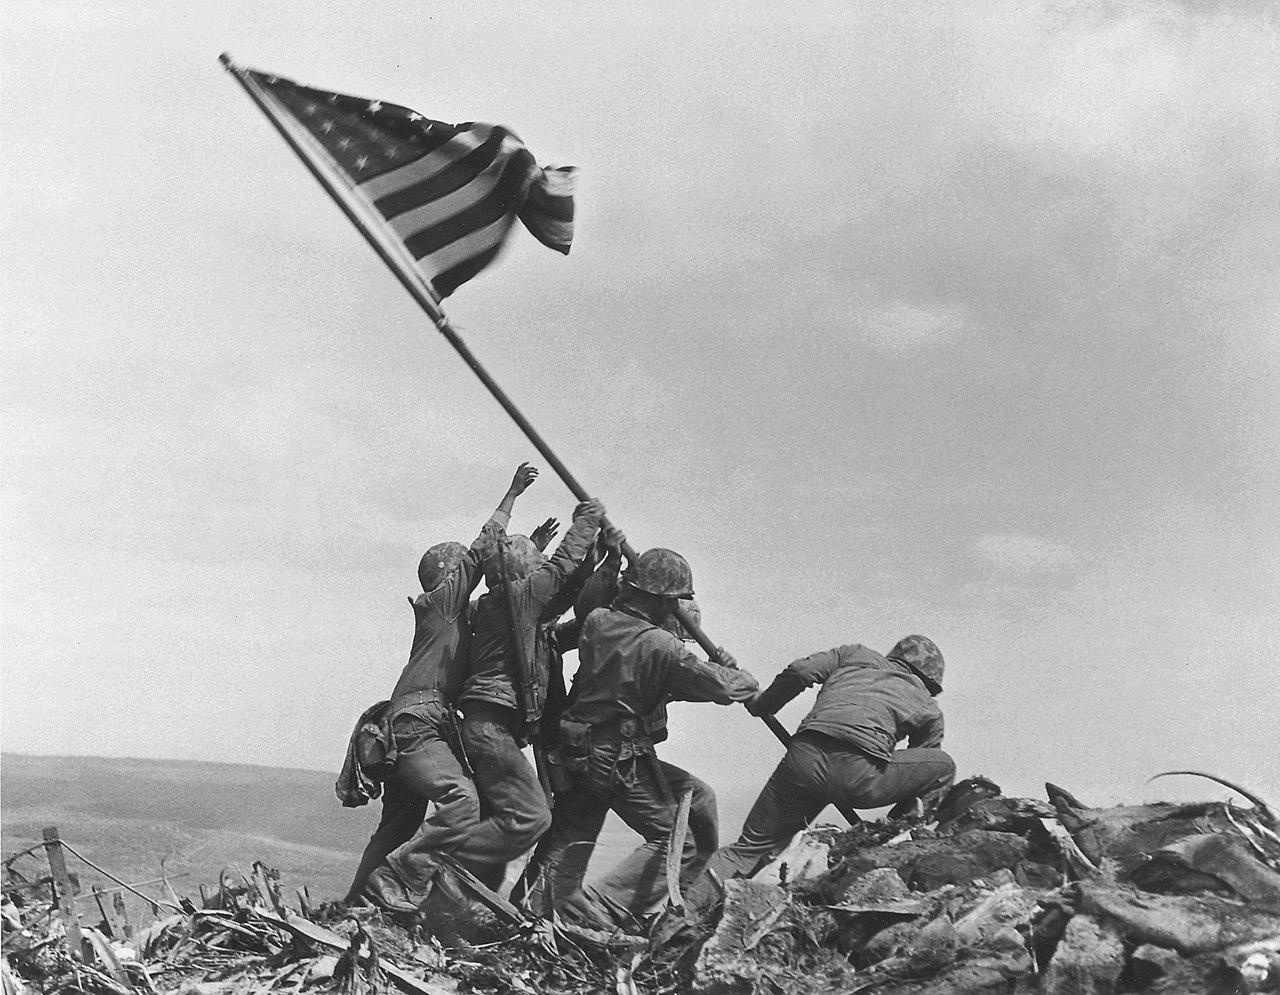 1280px-raising_the_flag_on_iwo_jima_by_joe_rosenthal.jpg